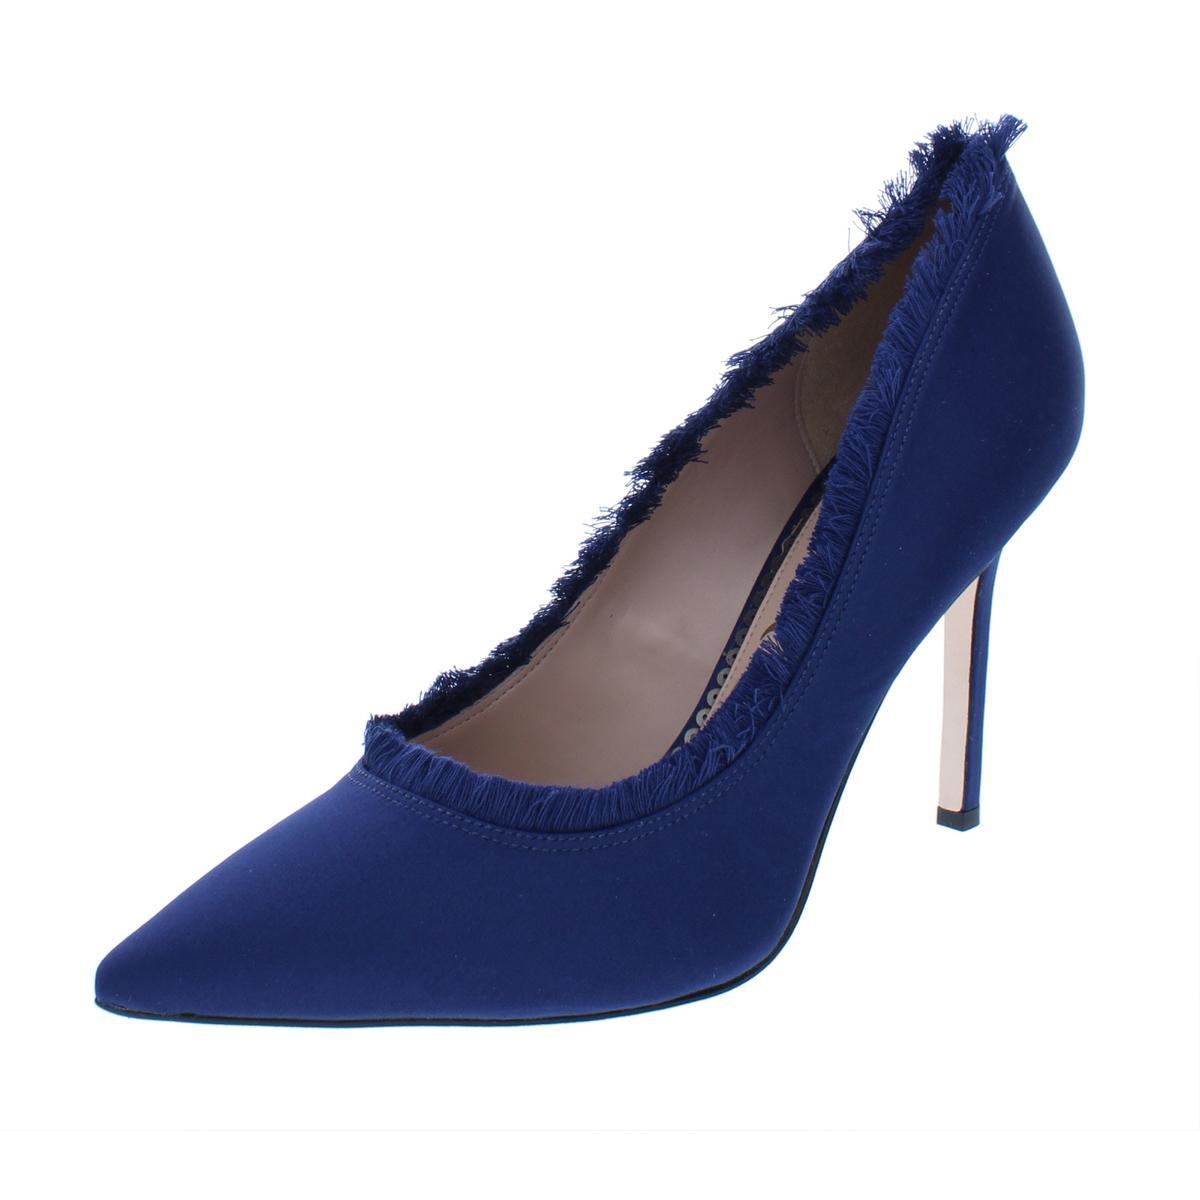 2b17e0b48 Details about Sam Edelman Womens Halan Navy Pointed Toe Heels Shoes 8.5  Medium (B